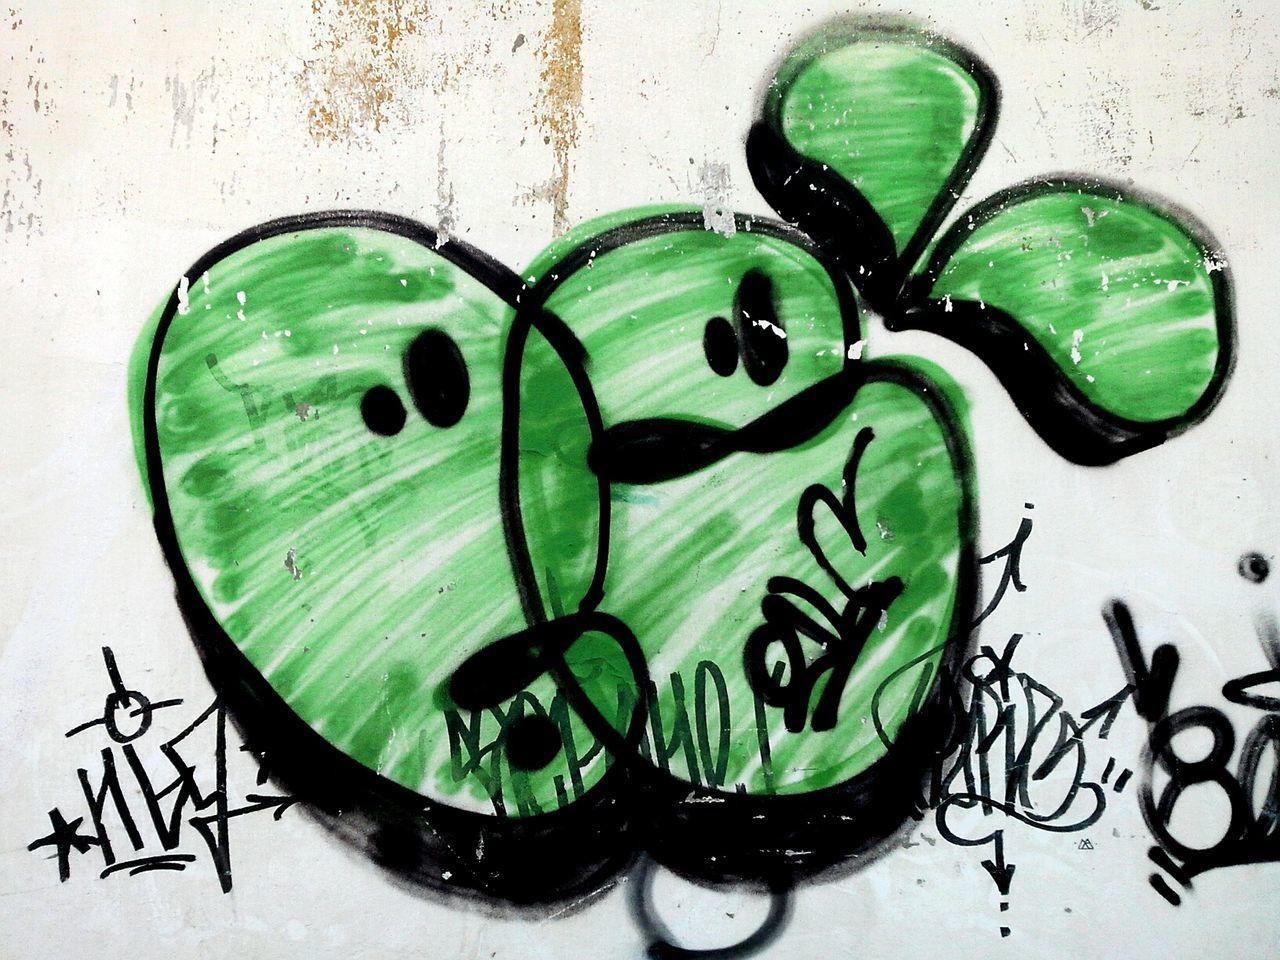 Wall Wall Art Art Painting Graffiti Graffiti Art Street Street Art Urban Green Scketch Idea Place Backgrounds City Oradea Oradea,România Nagyvárad Outdoors No People Day City Street Bihor Romania Desen